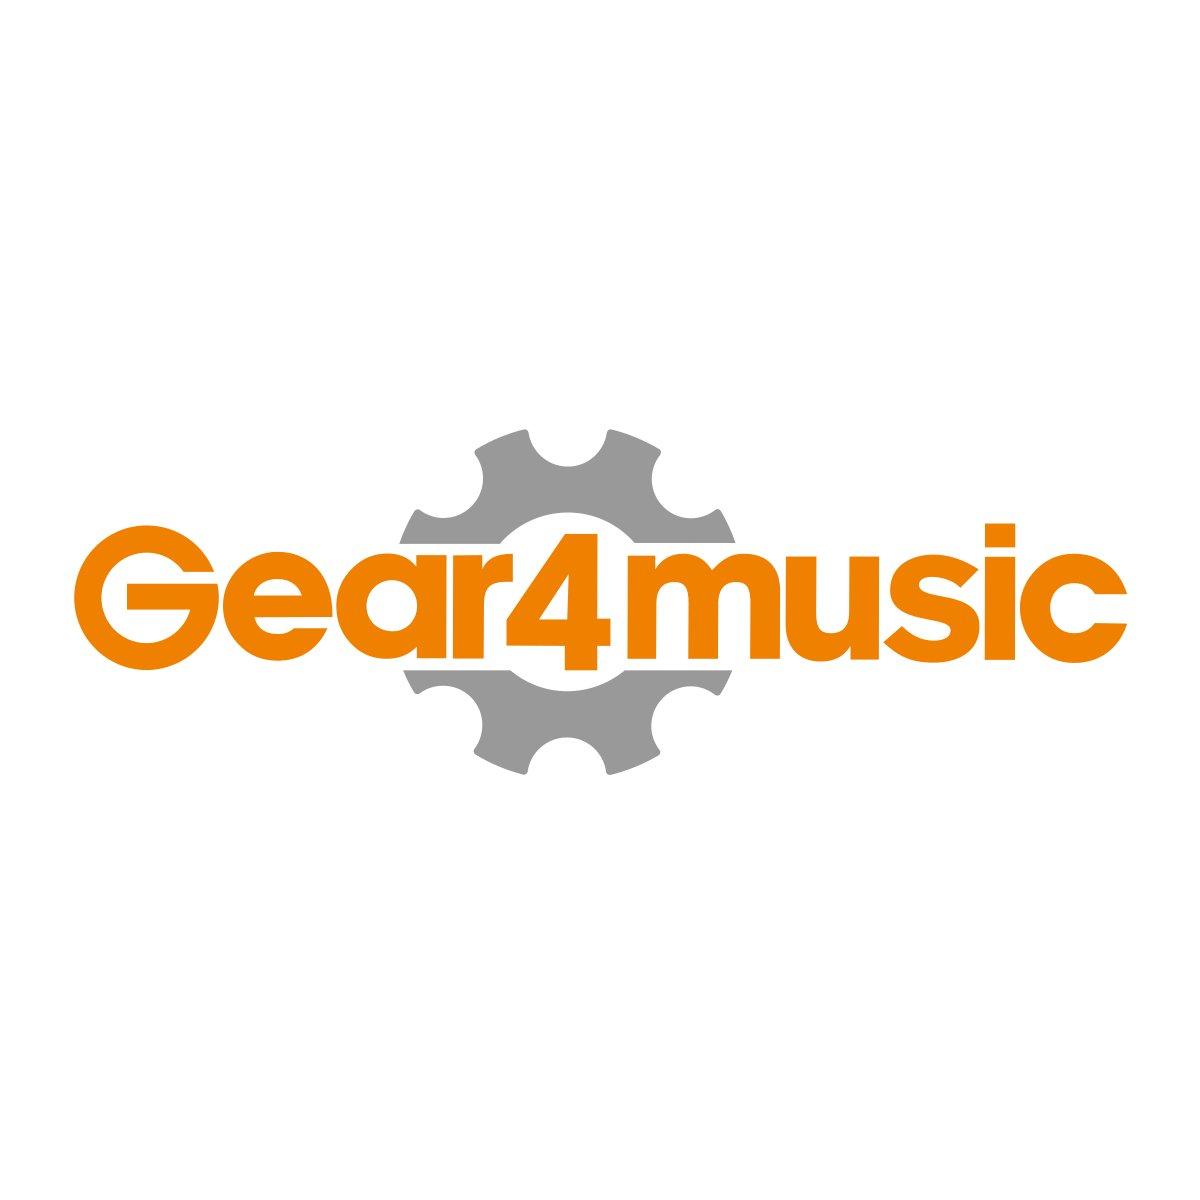 zildjian k custom 14 39 39 session hi hat cymbals at gear4music. Black Bedroom Furniture Sets. Home Design Ideas